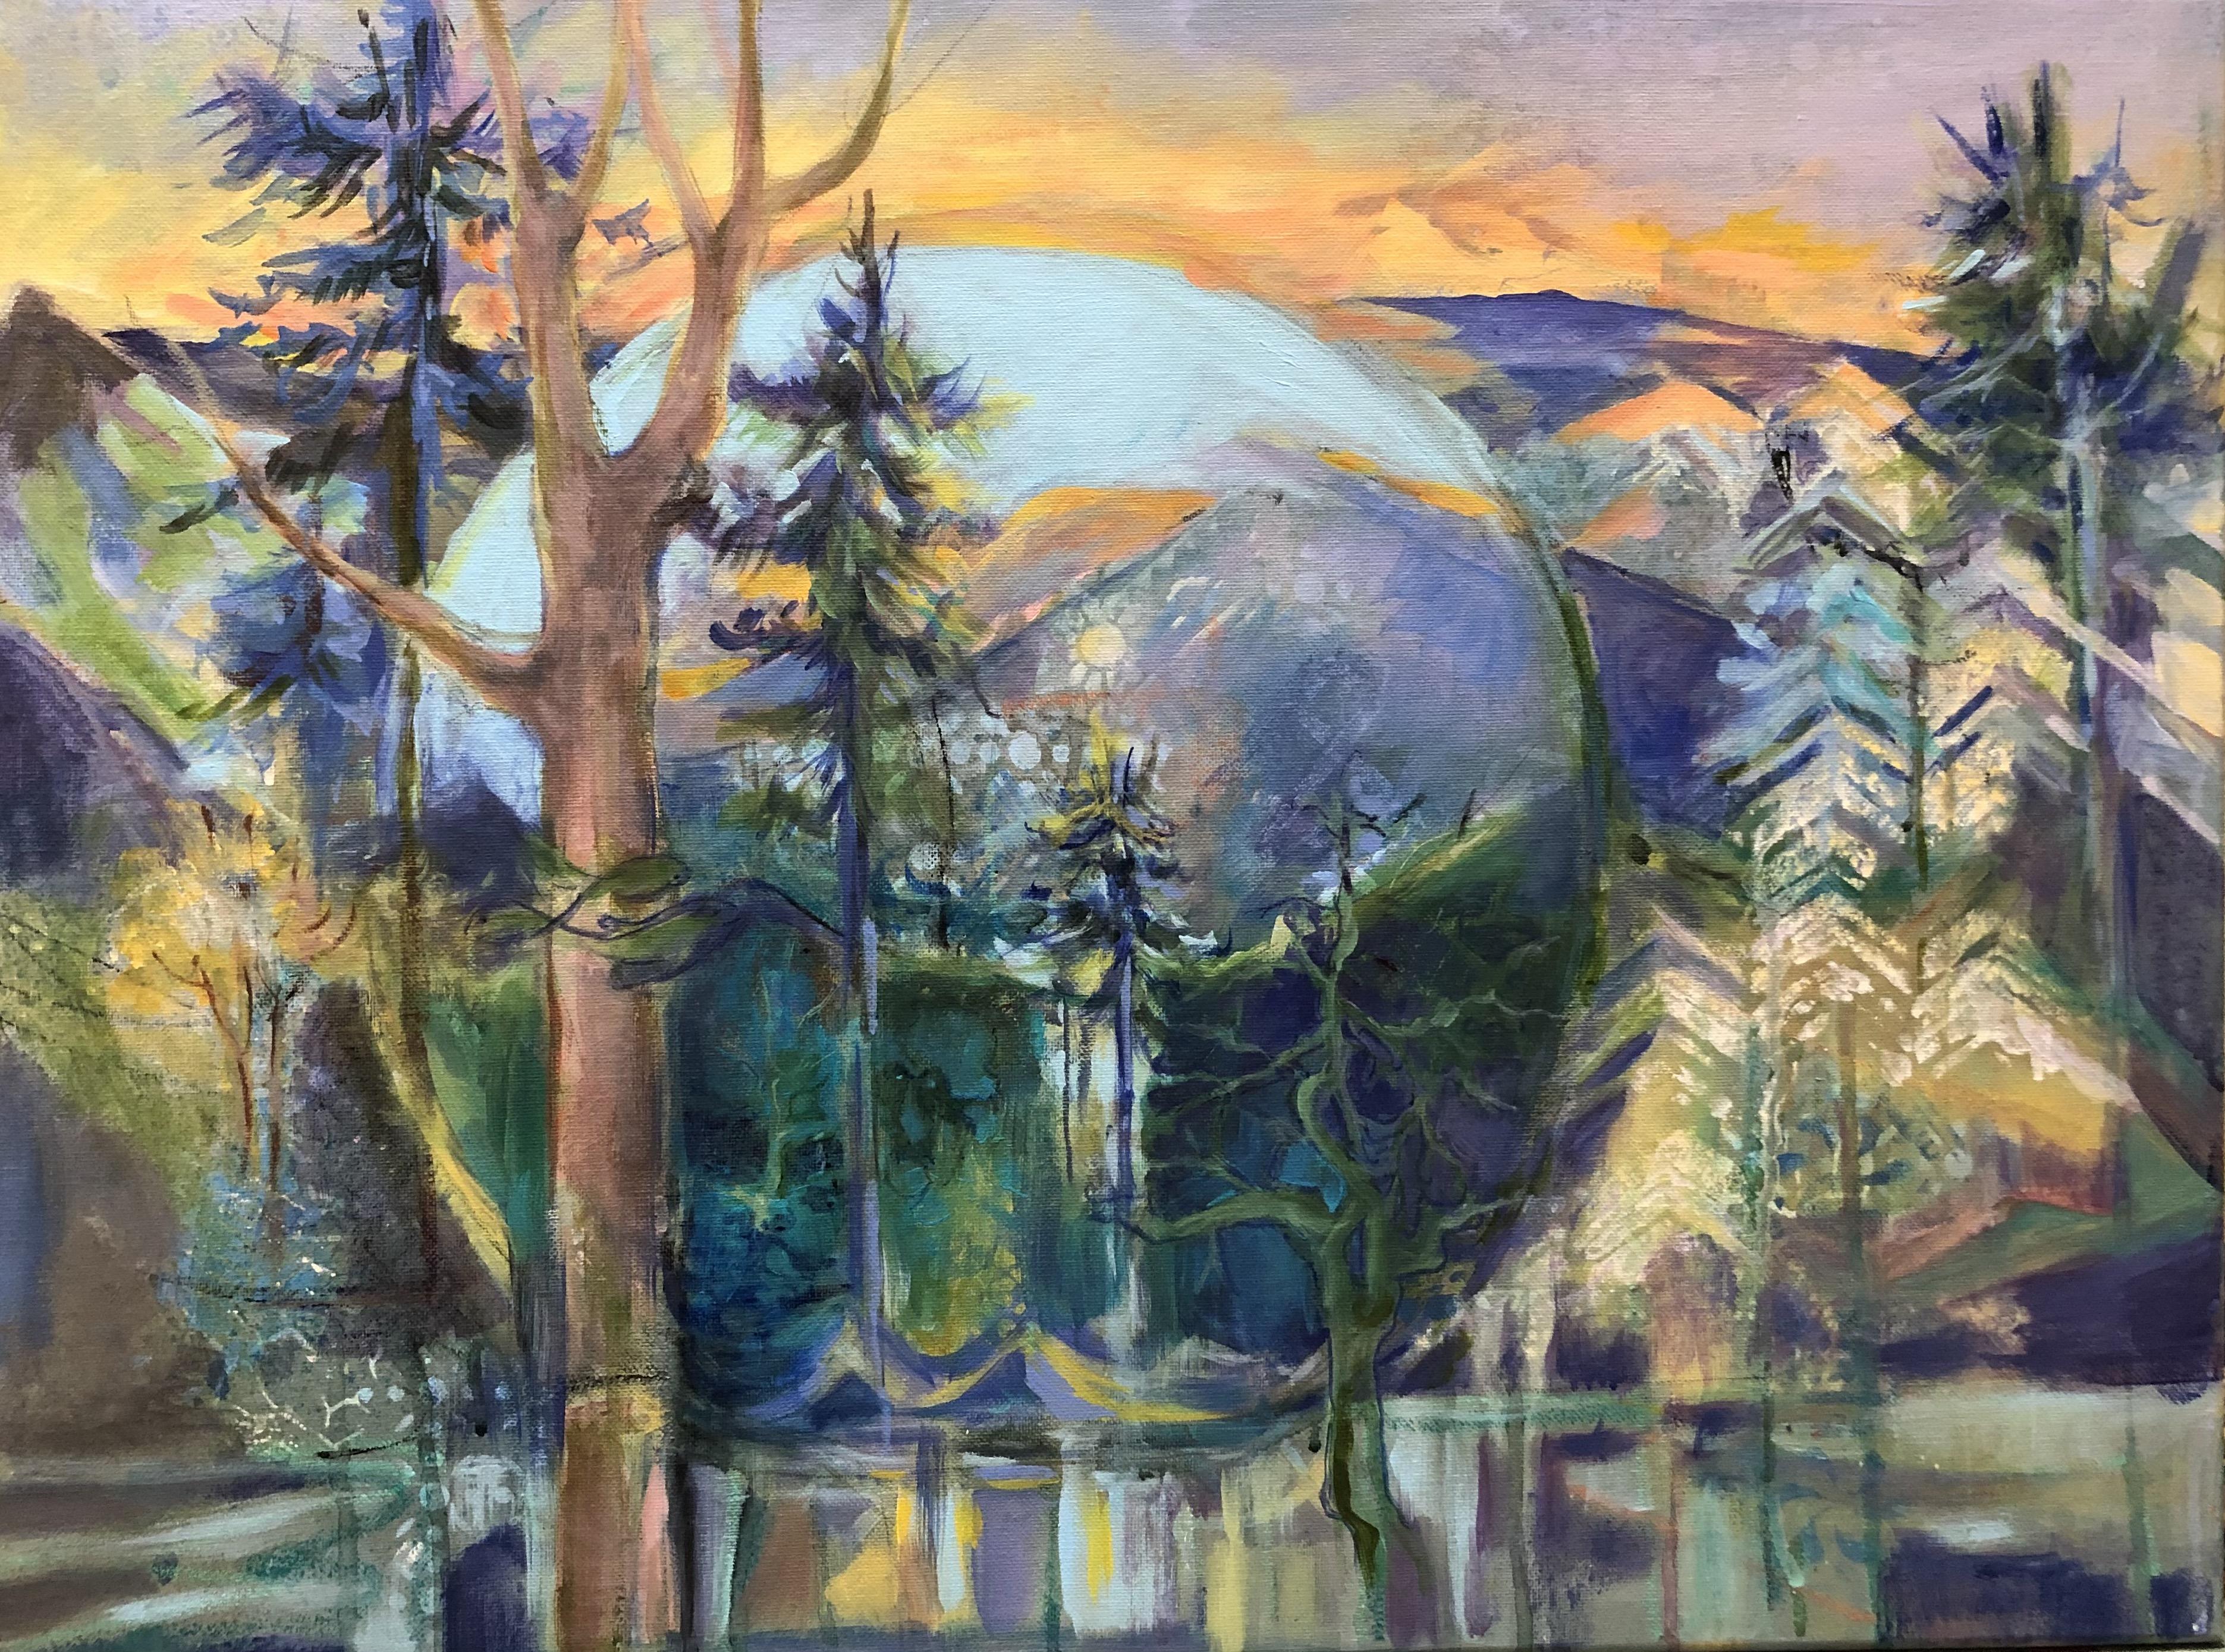 A Blue Moon Arising | Heidi Ludwig | Acrylic on canvas | 18 x 24